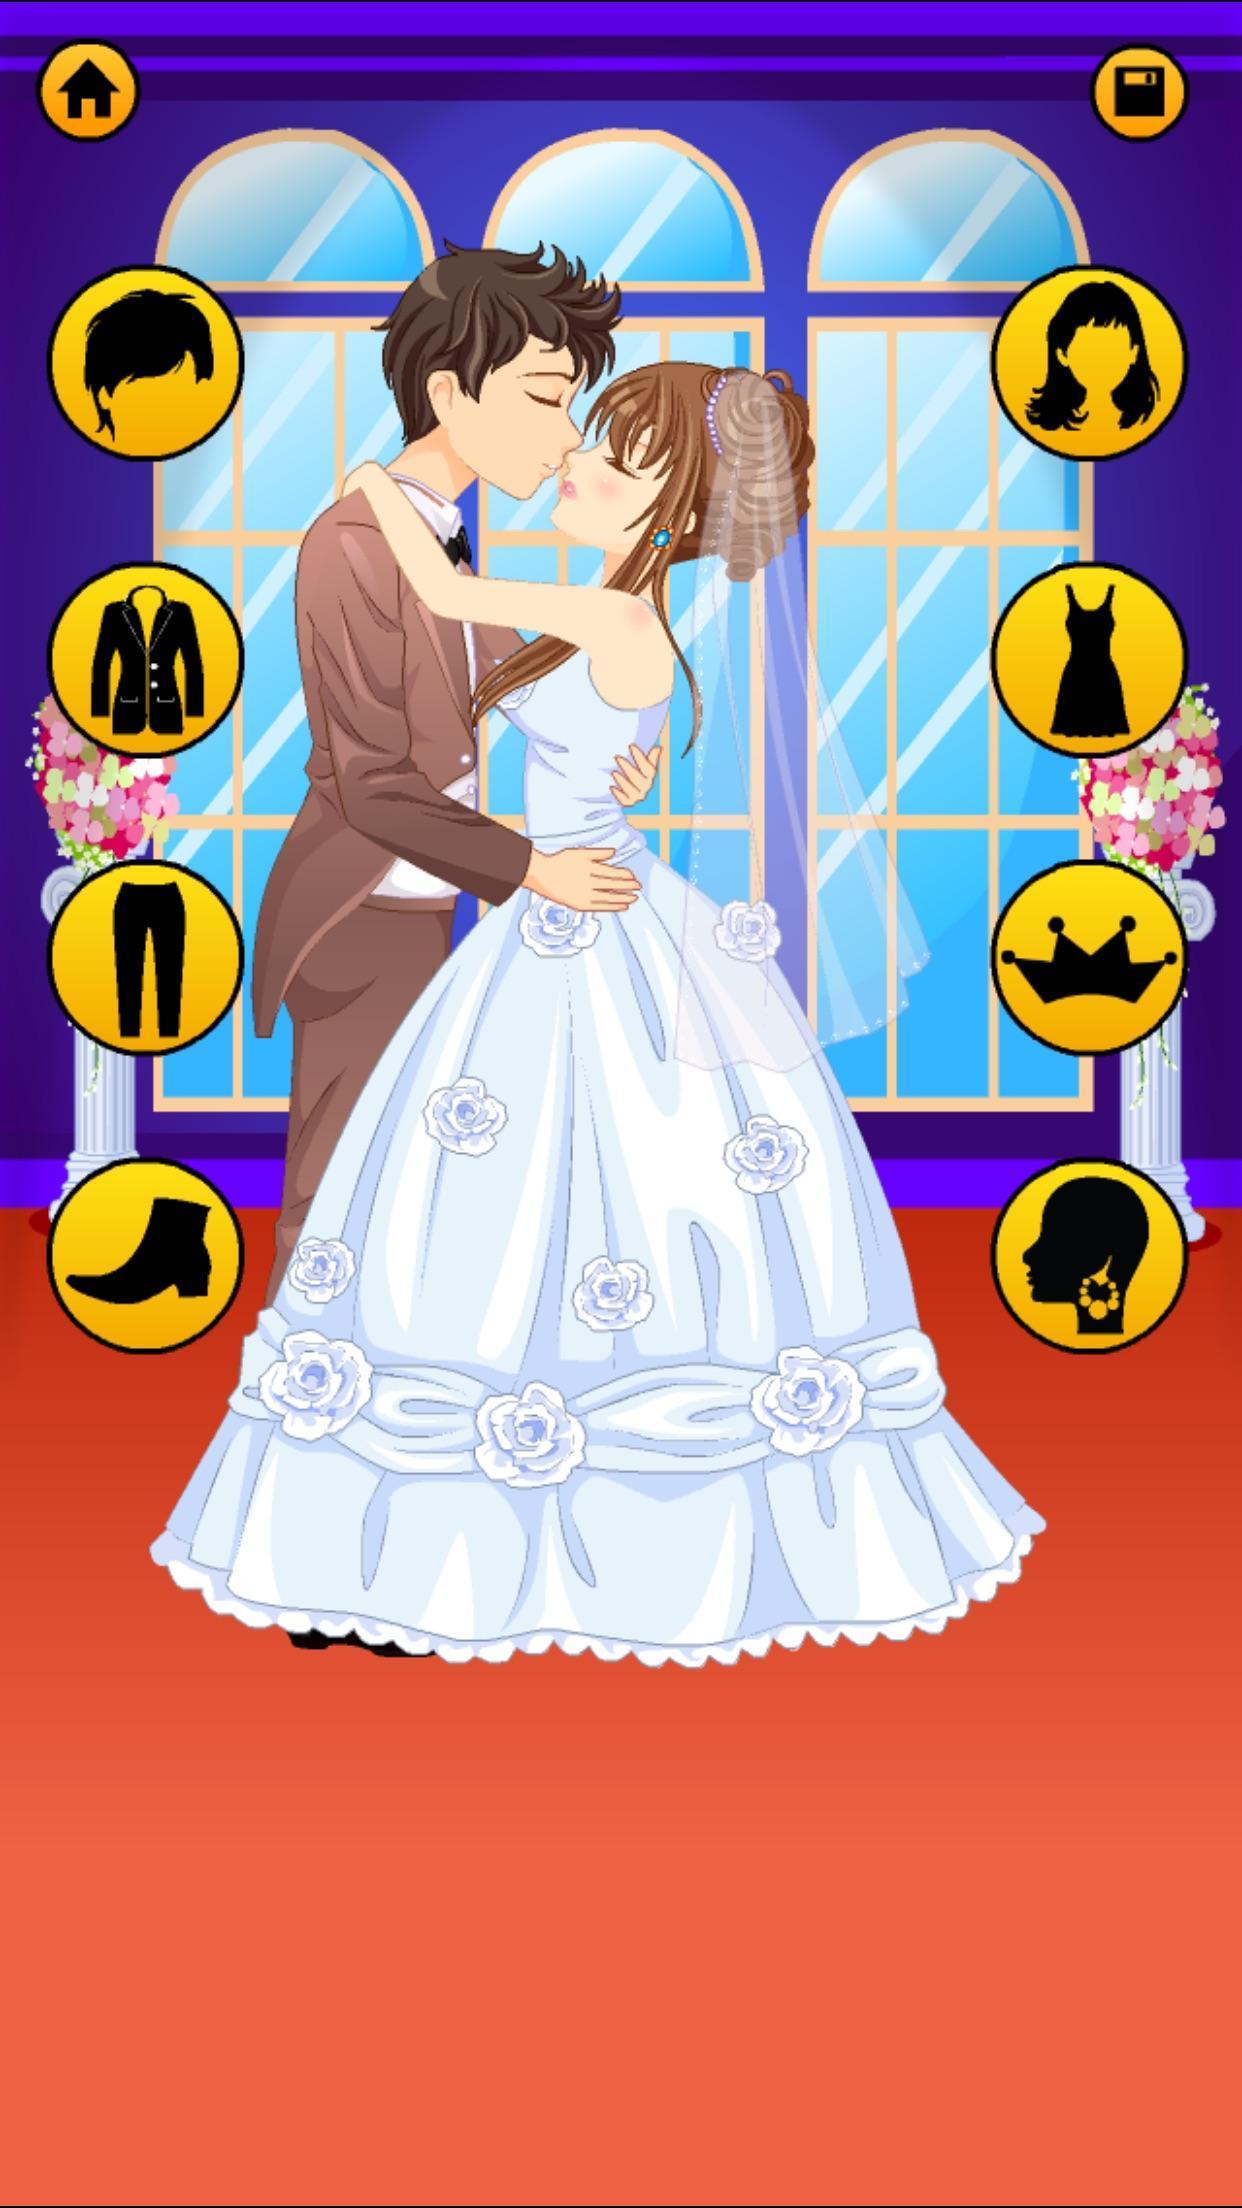 Anime Dress Up Games For Girls - Couple Love Kiss 3.3 Screenshot 19